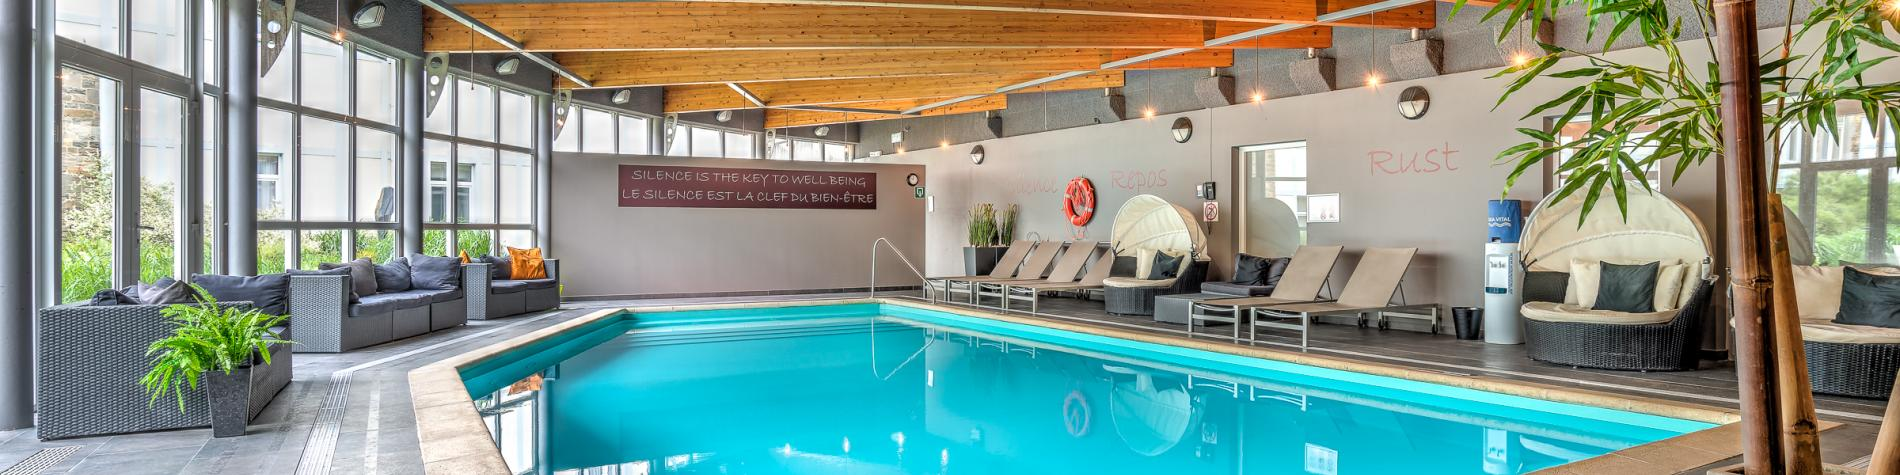 Radisson Spa piscine